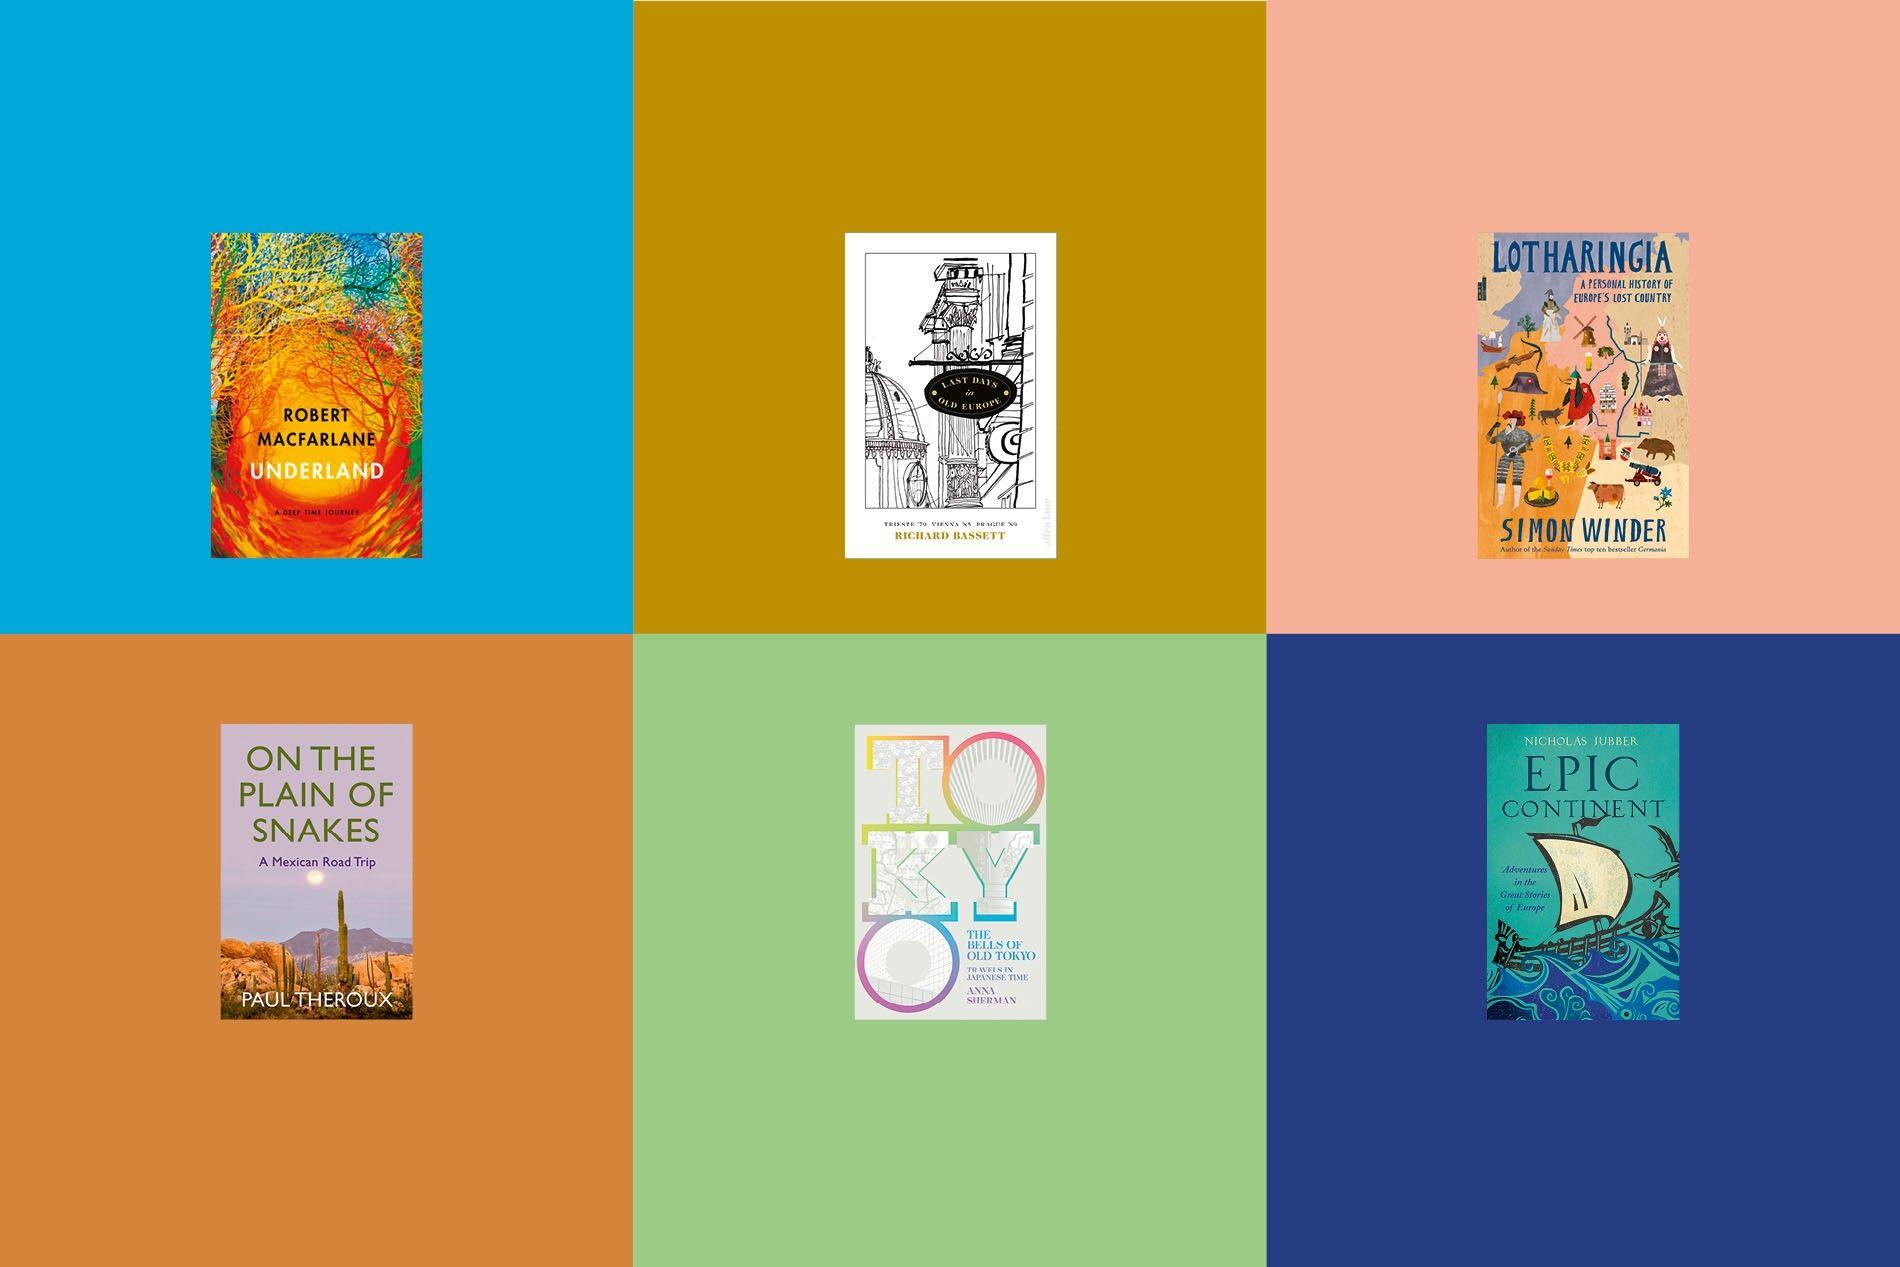 The Edward Stanford Travel Writing Awards shortlist.